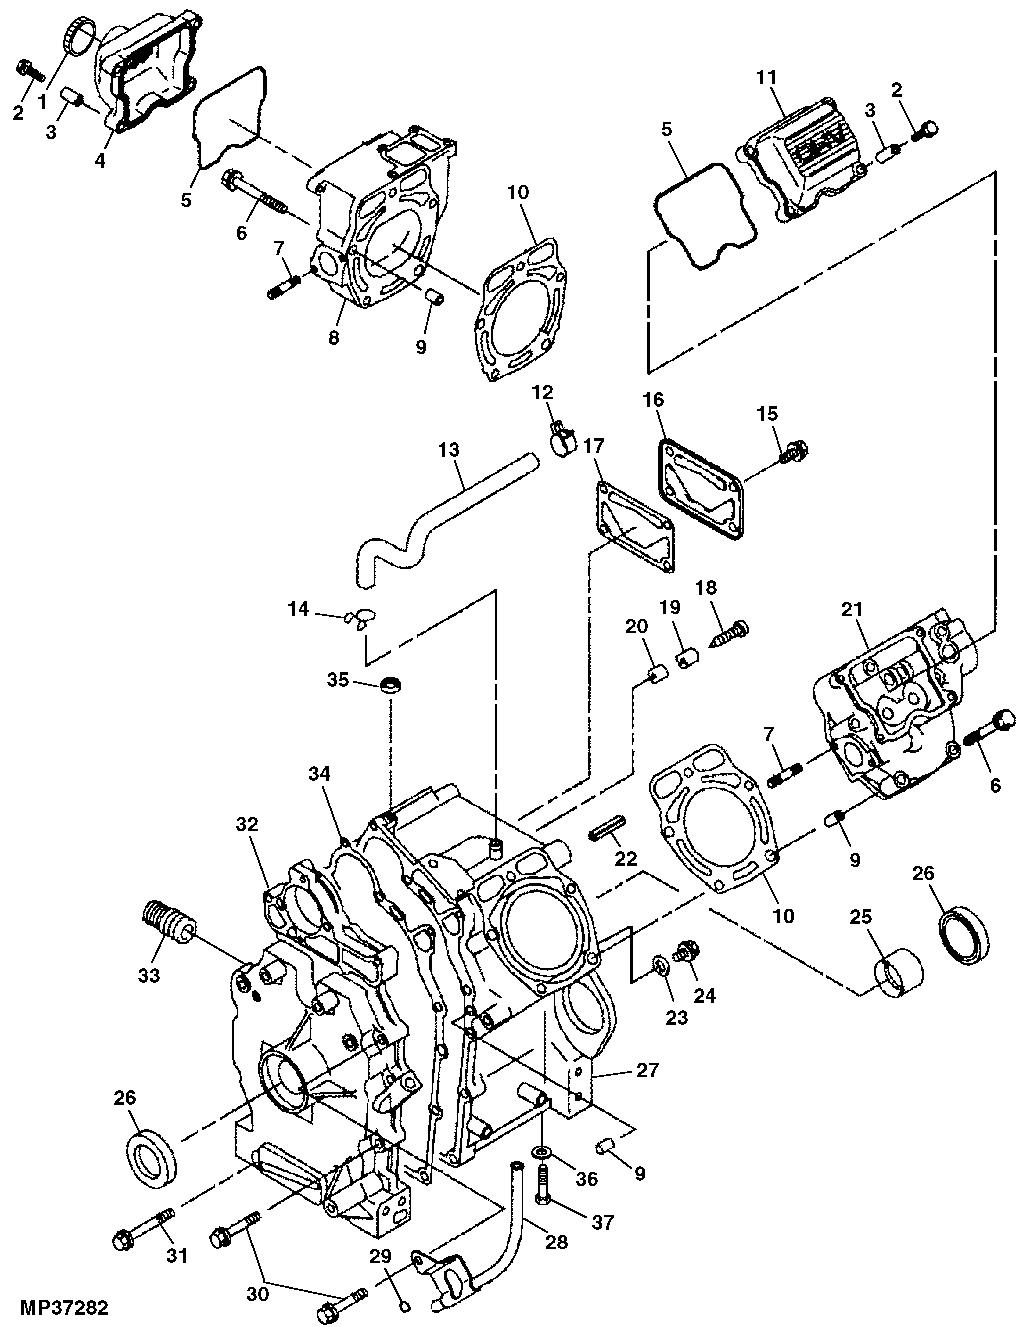 John Deere 116 Carburetor Parts. John Deere D130 Wm Nobbe Co St Louis Missouri. John Deere. Fly Wheel John Deere D110 Parts Diagram At Scoala.co